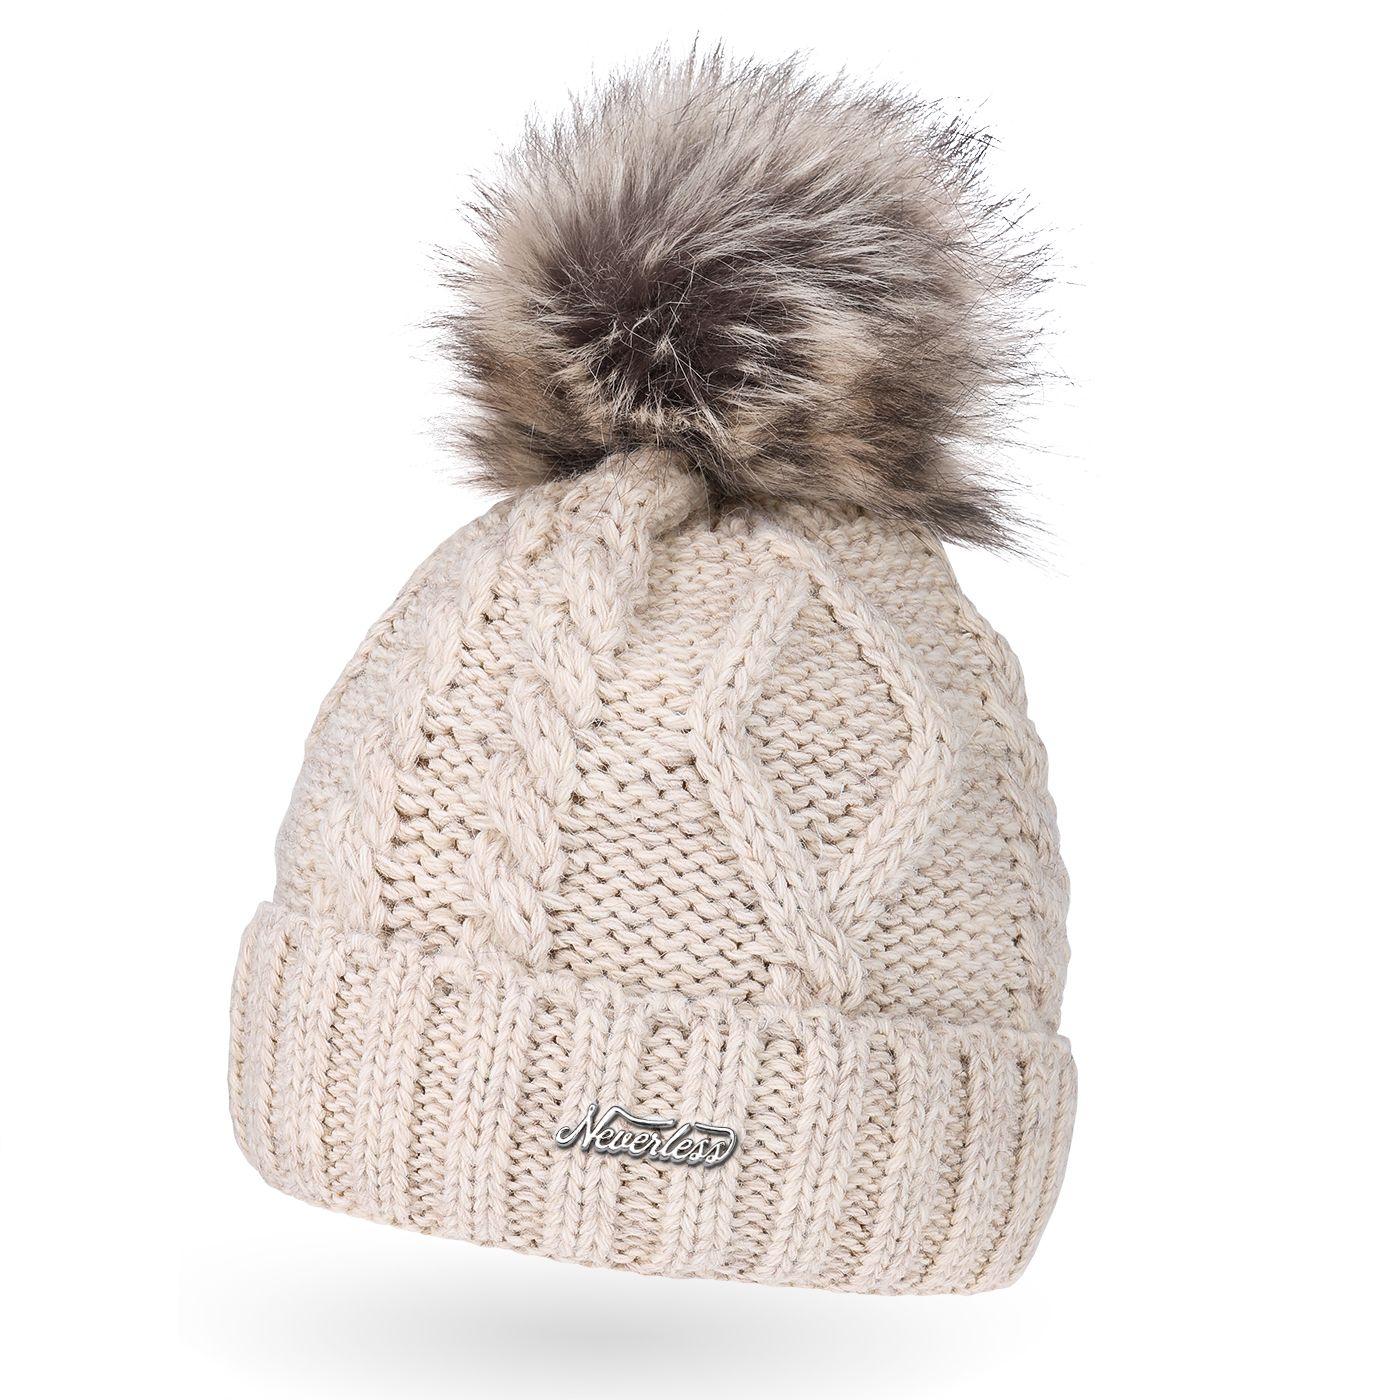 92ac5f13492fa7 gefütterte Damen Strickmütze Fell-Bommel Fleece-Futter Kunstfell  Winter-Mütze Bommelmütze Neverless®